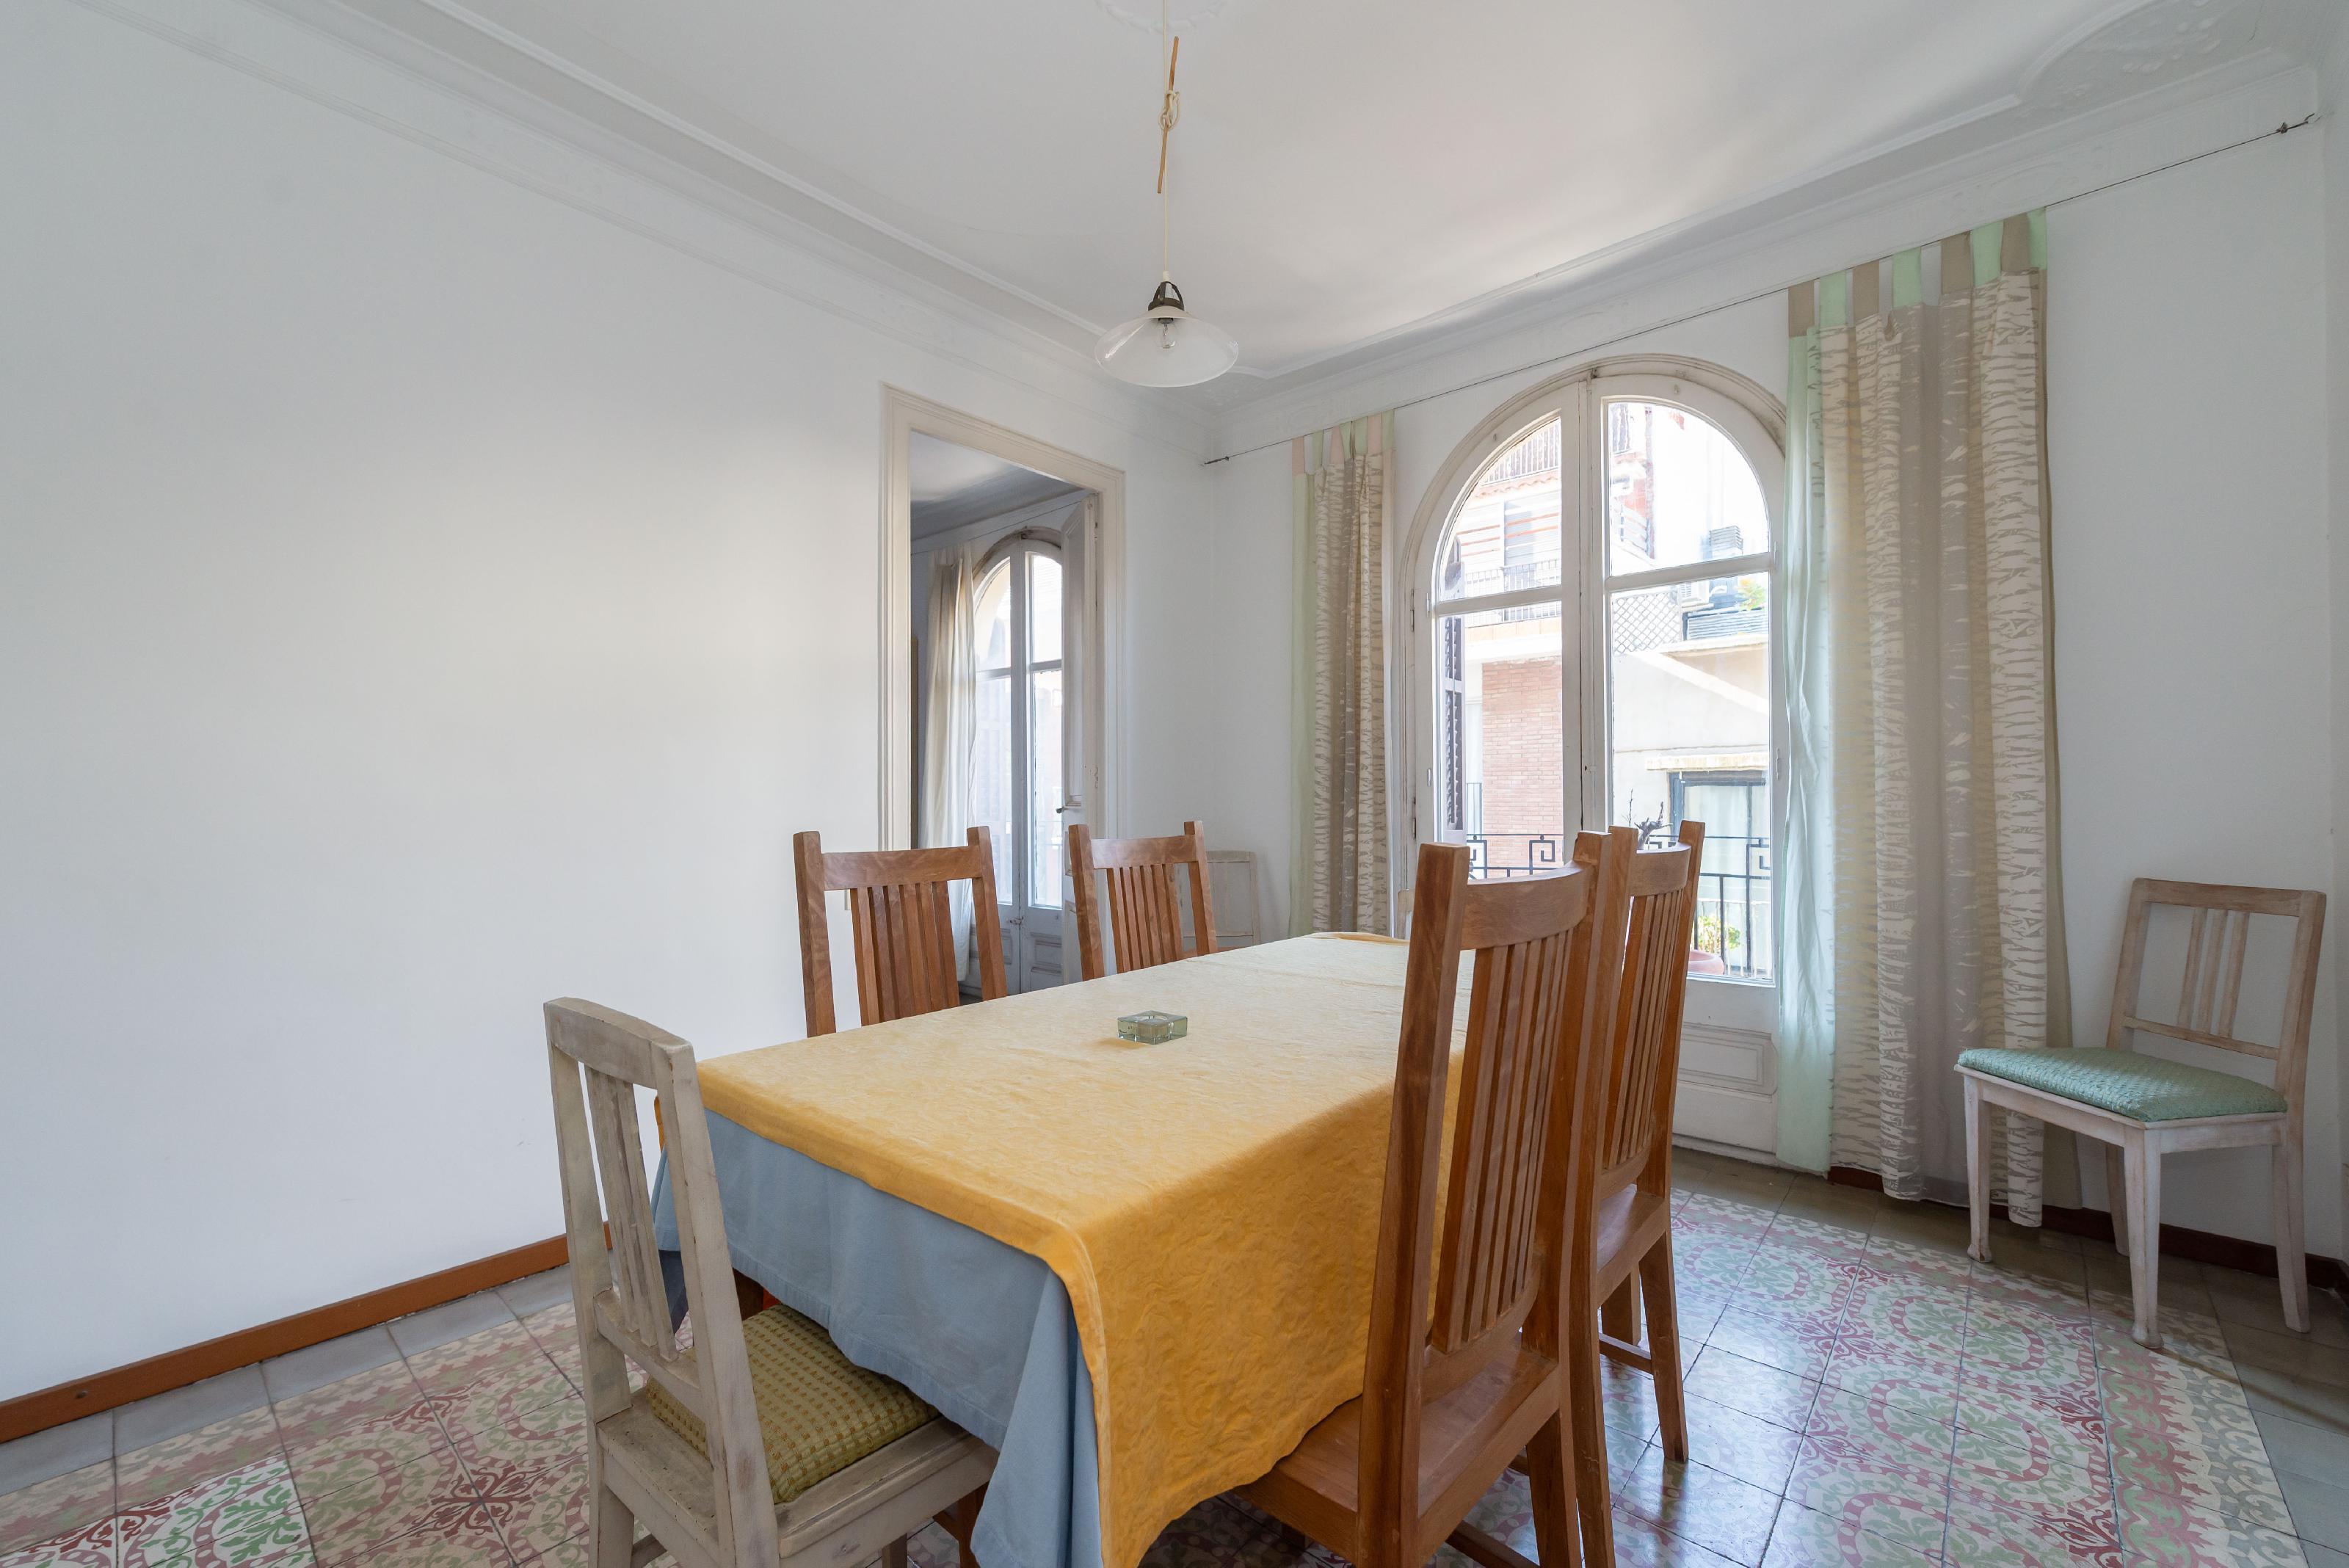 250582 Flat for sale in Sarrià-Sant Gervasi, Sant Gervasi-Galvany 6